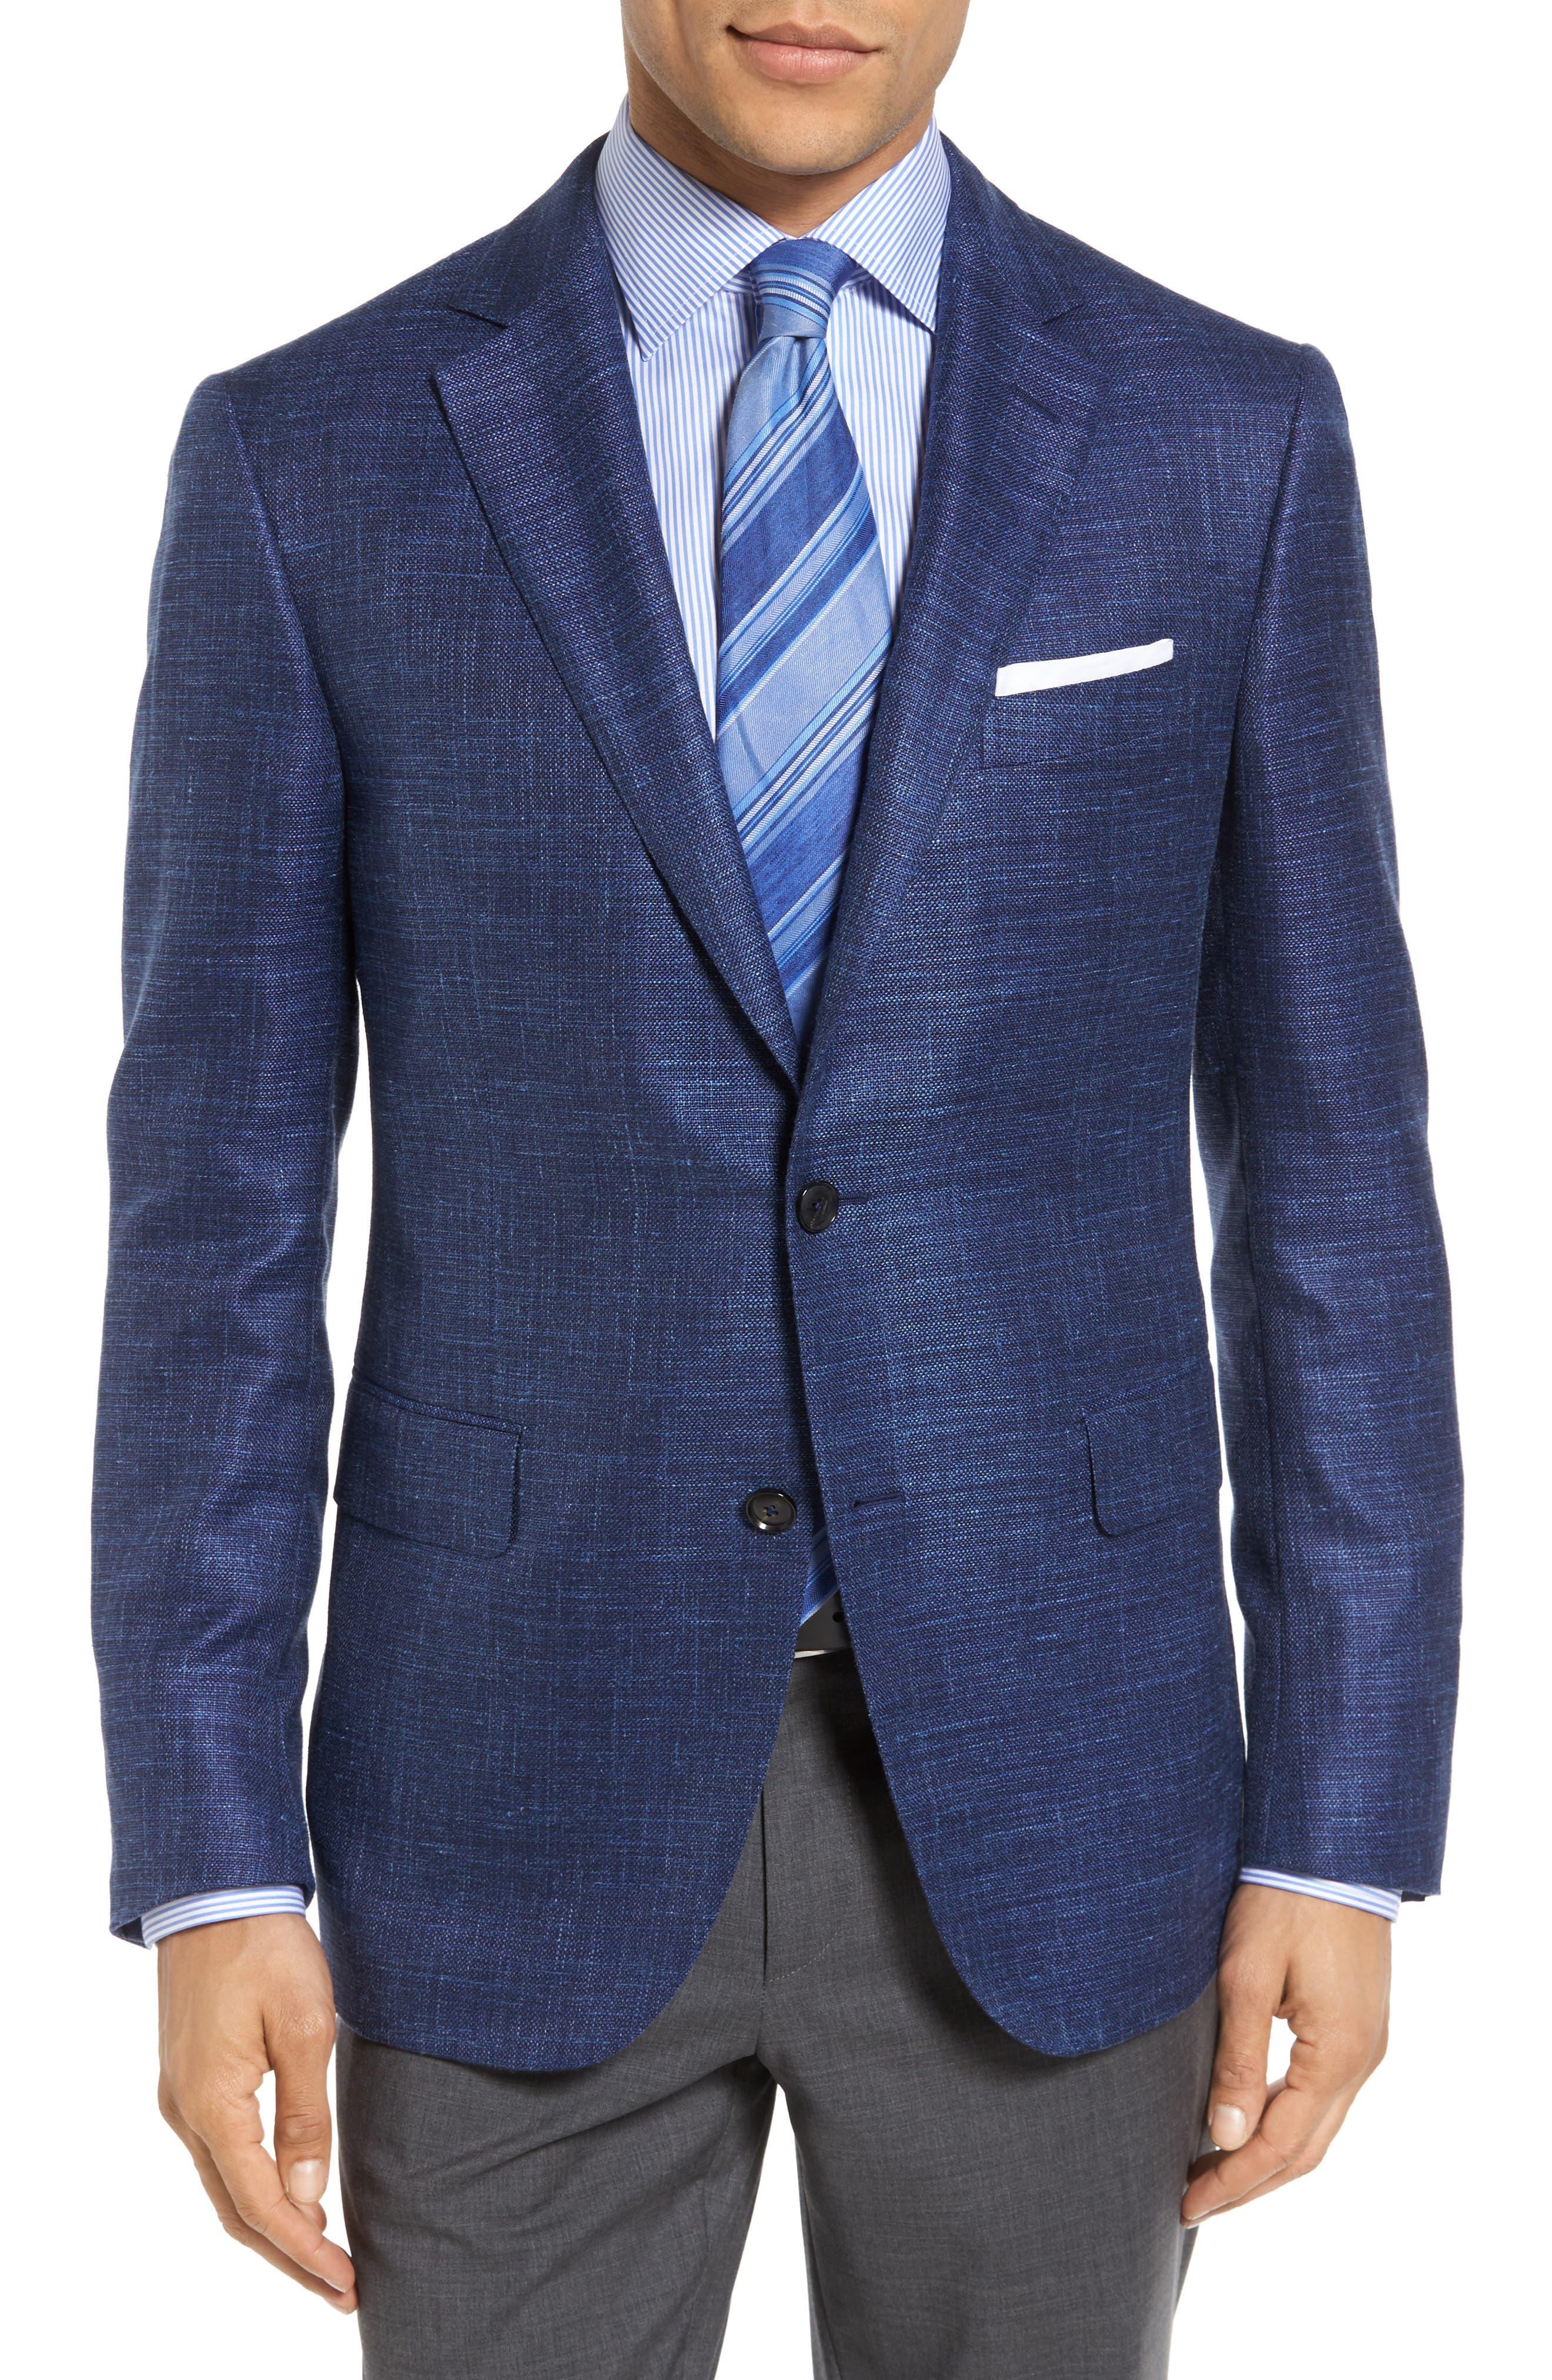 Alternate Image 1 Selected - Pal Zileri Plaid Wool Blend Blazer